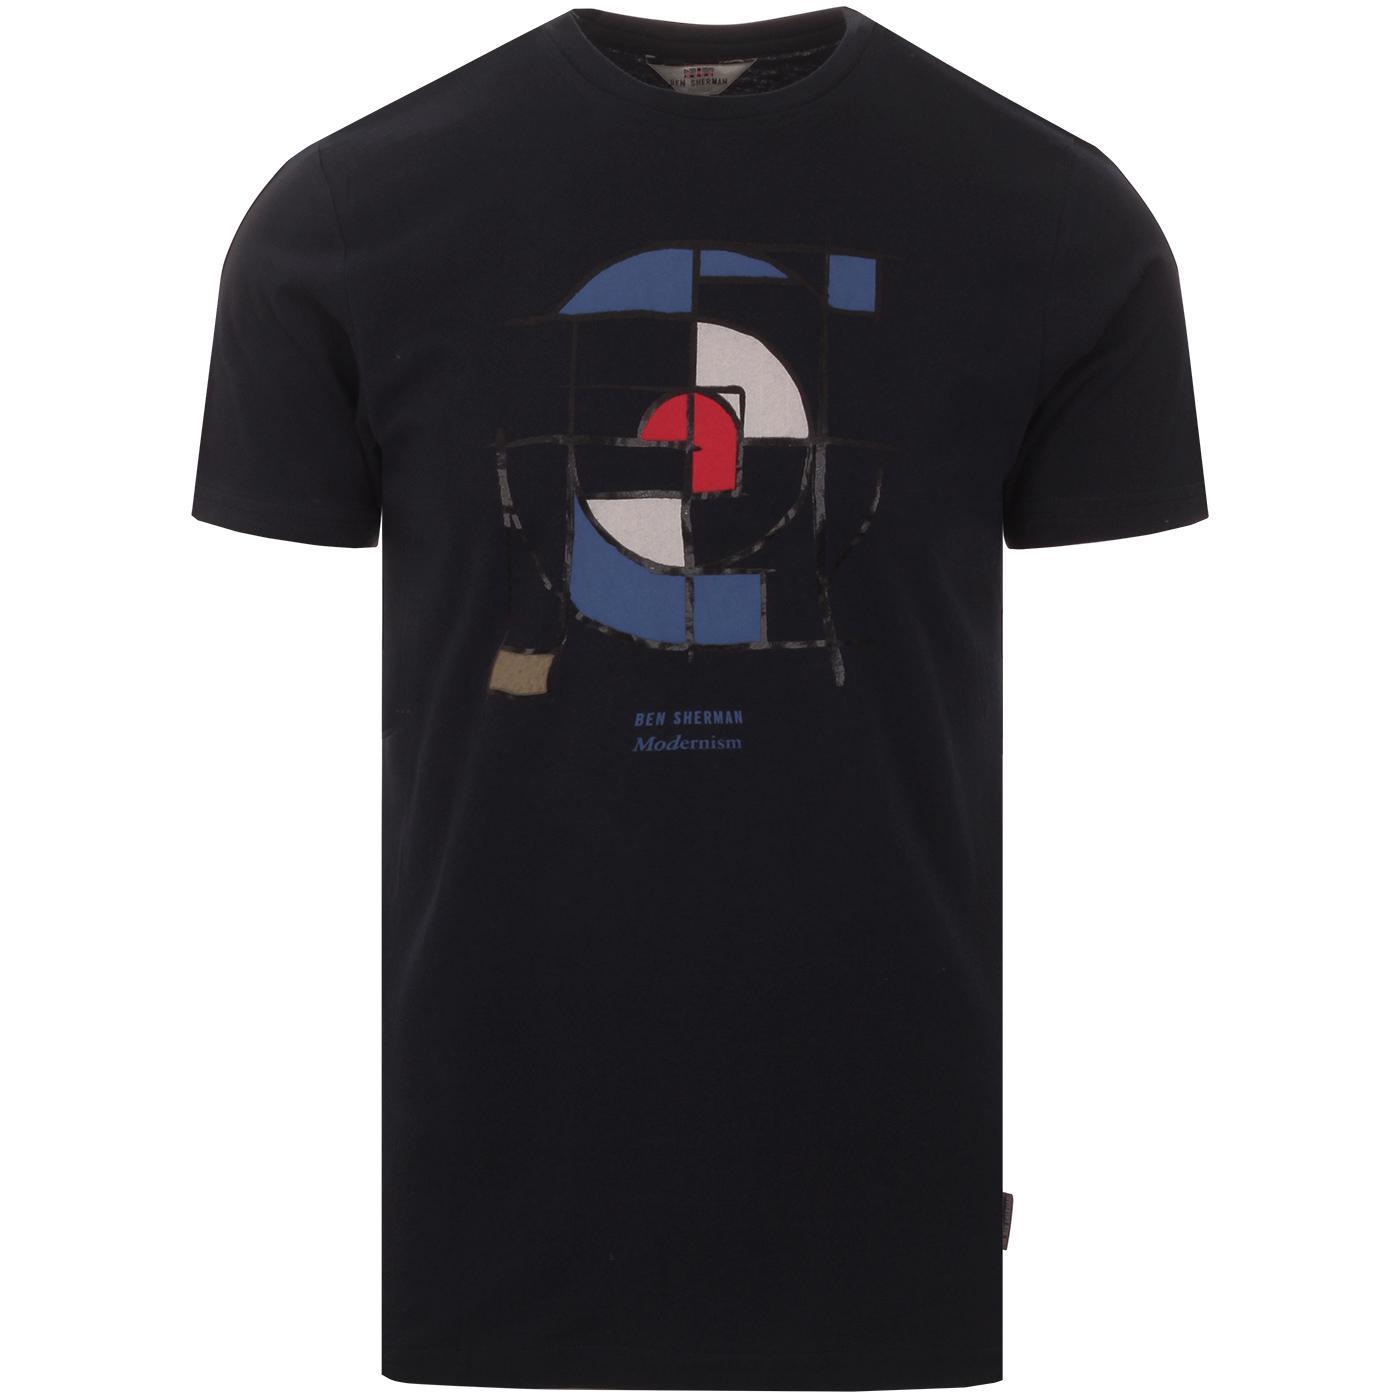 Mondrian Mod Target BEN SHERMAN Retro T-shirt (N)